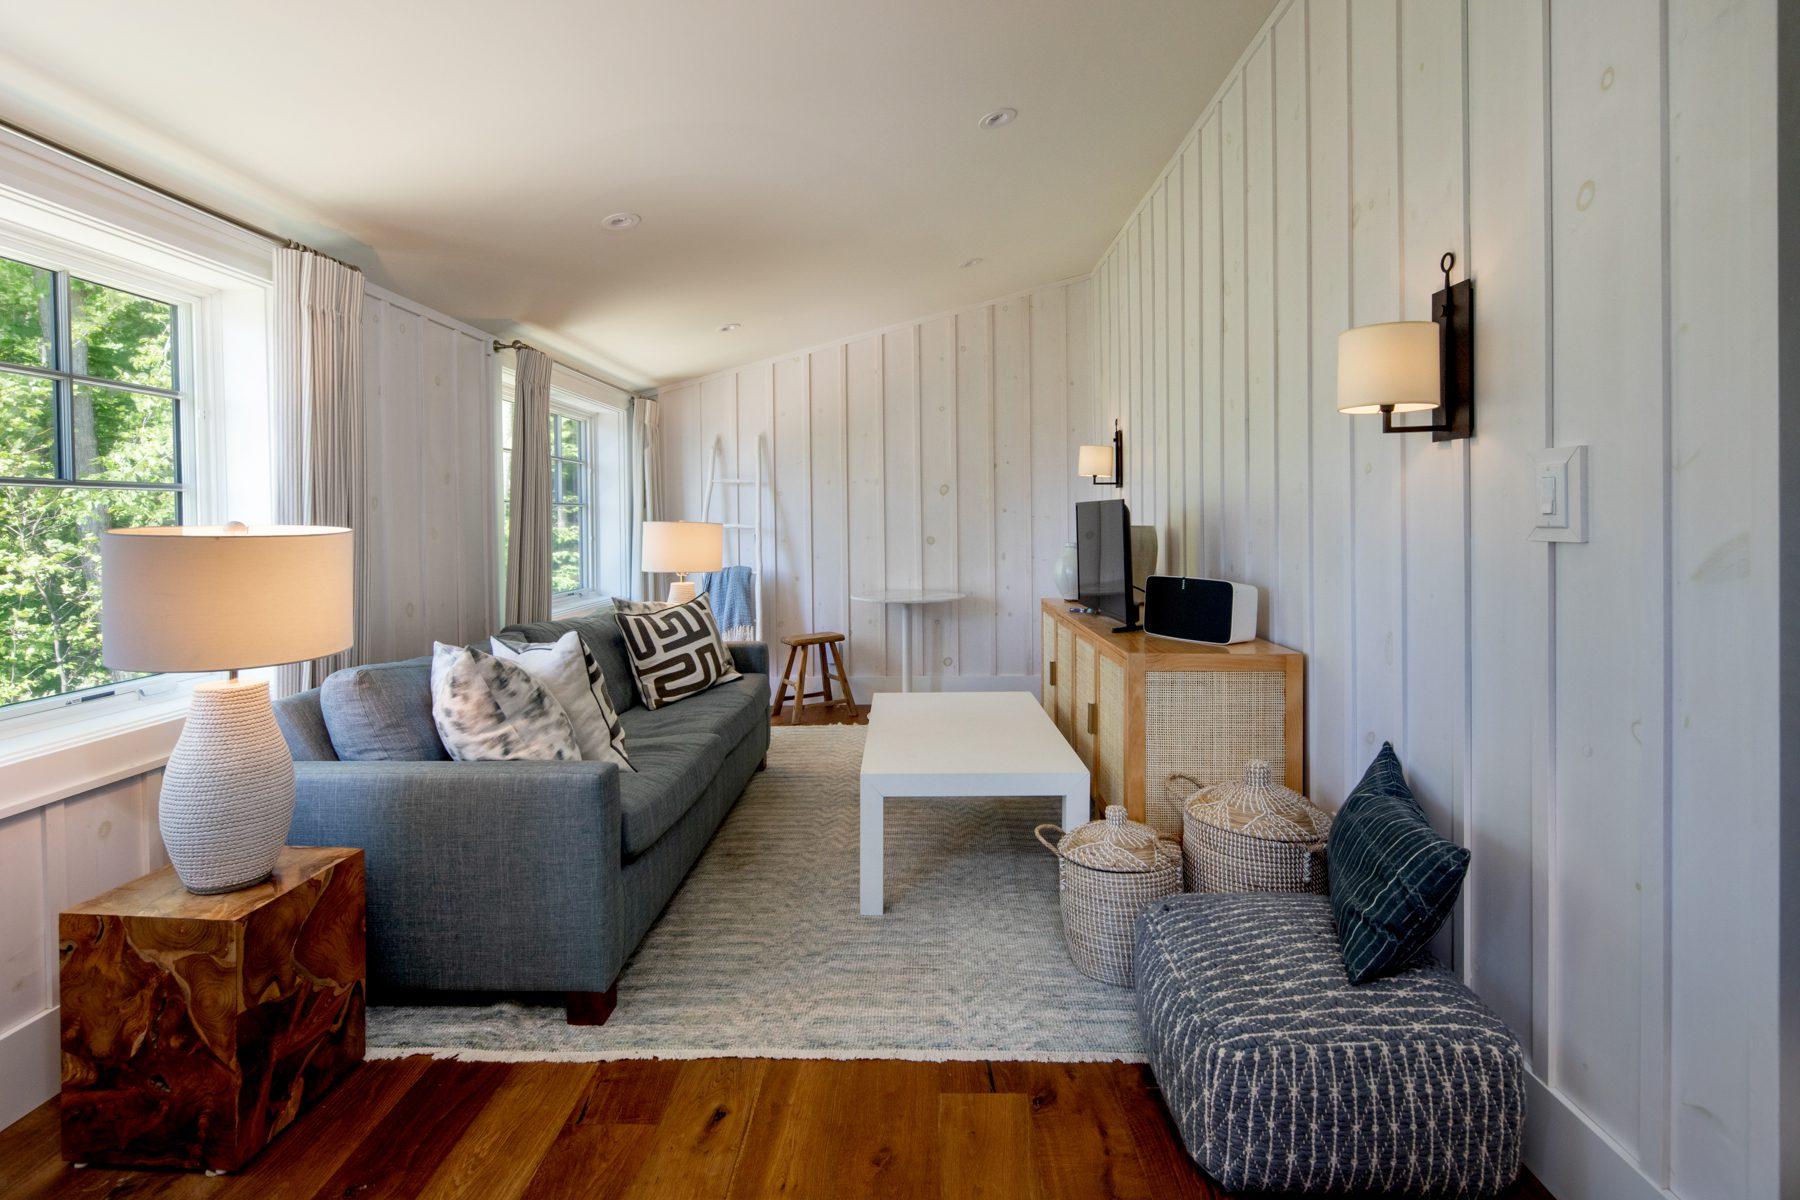 Normerica-Timber-Homes-Timber-Frame-Portfolio-Beachside-Bliss-Interior-Suite-Above-Garage-Living-Area